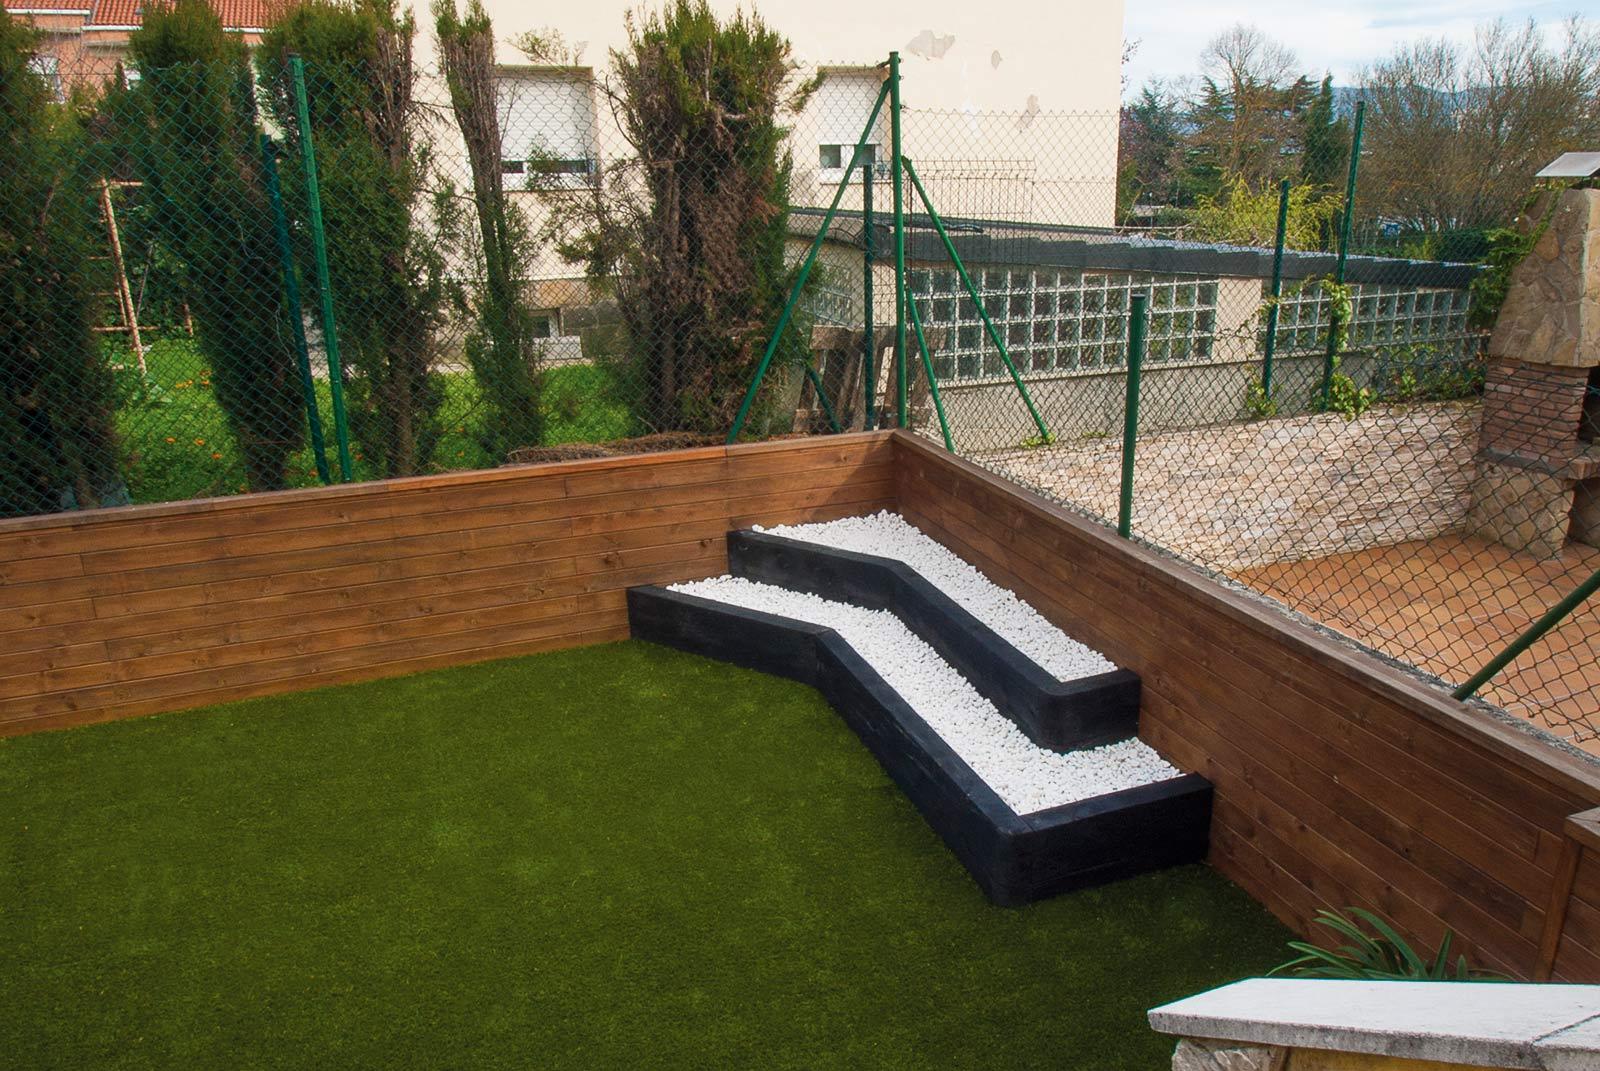 jardin-cespe-artificial-tarima-traviesas-6